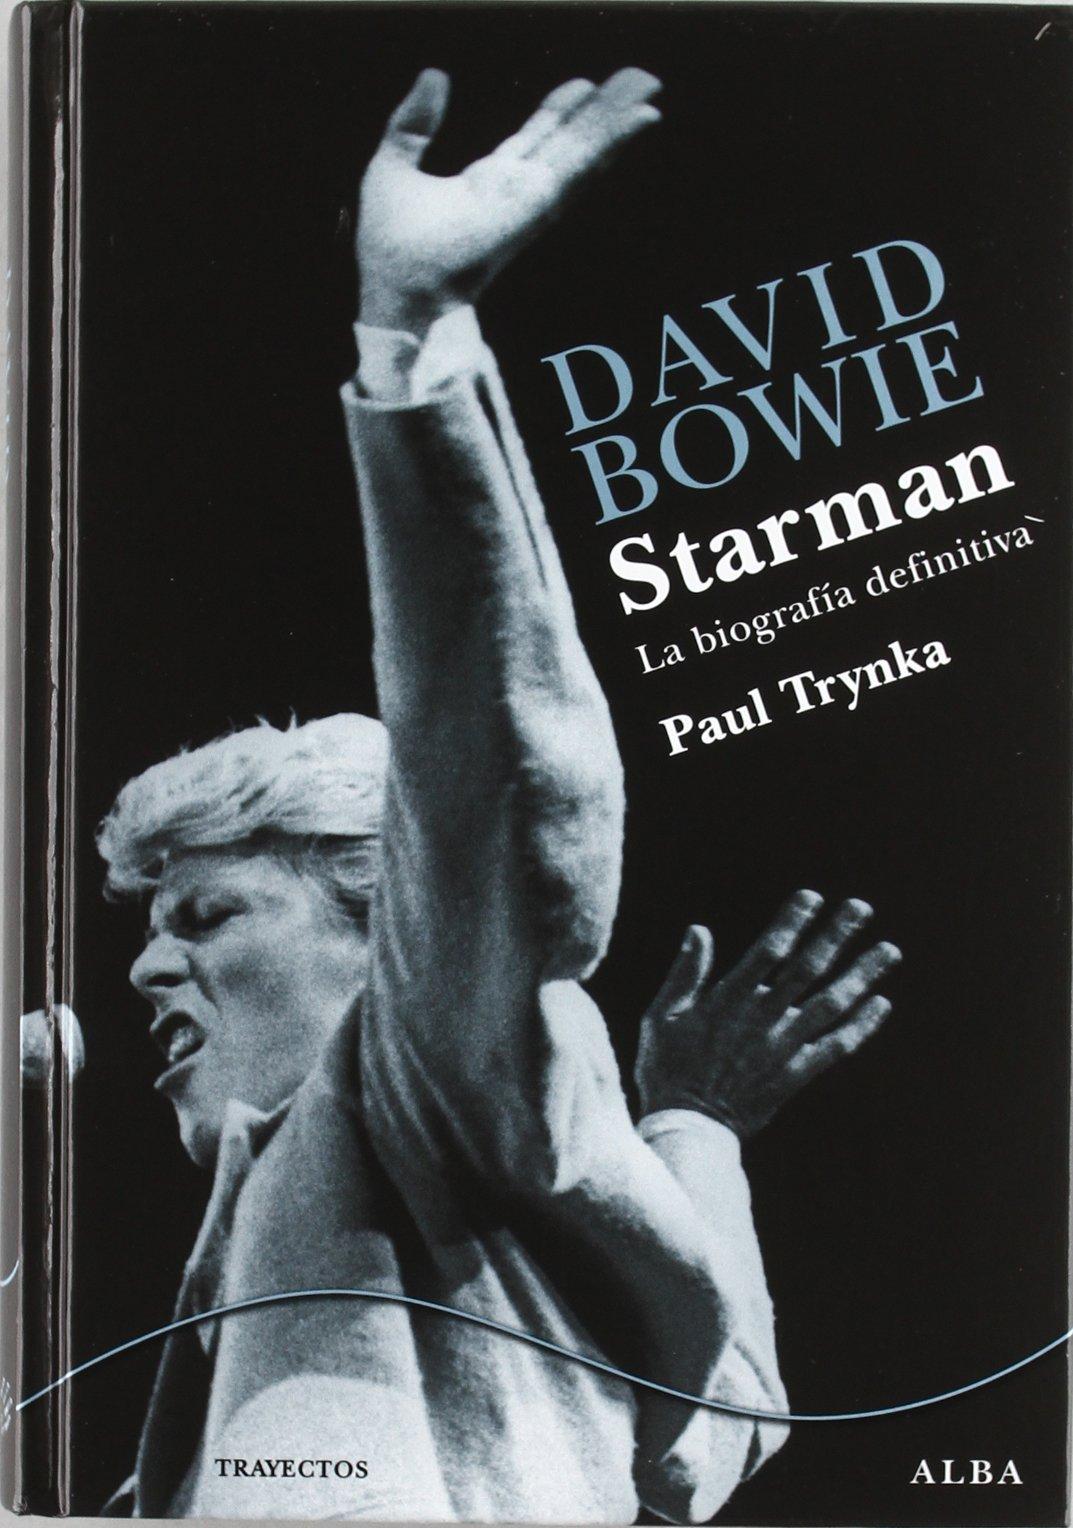 David Bowie: starman: la biografia definitiva - Paul Trynka